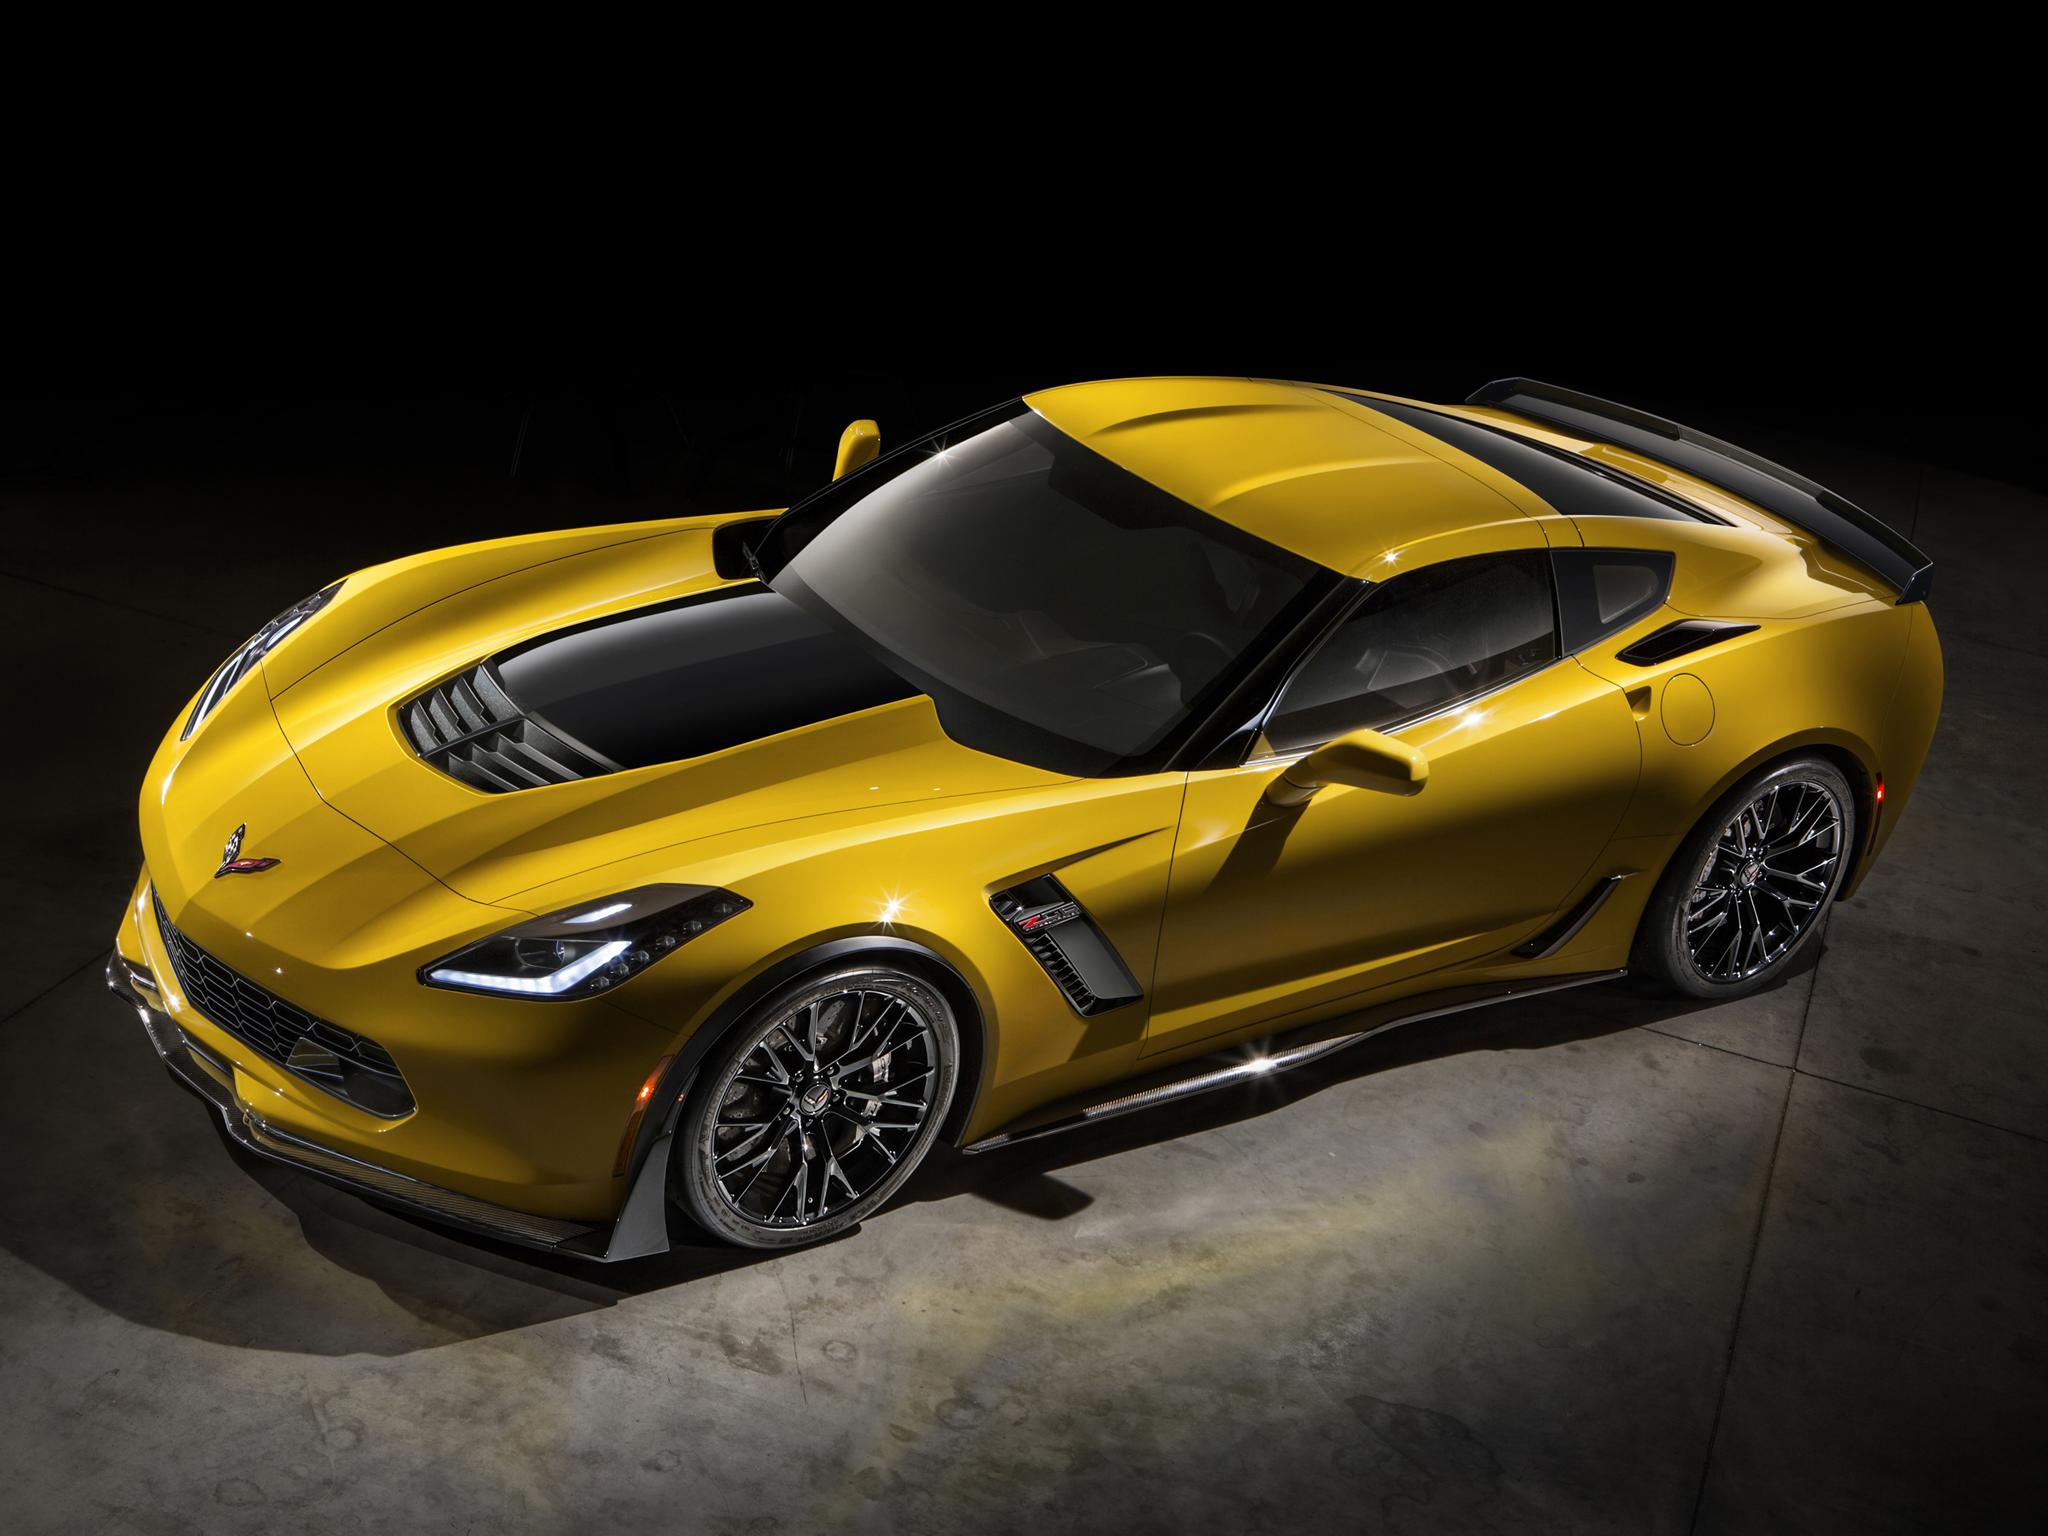 2015 chevrolet corvette stingray z06 c 7 supercar muscle. Black Bedroom Furniture Sets. Home Design Ideas